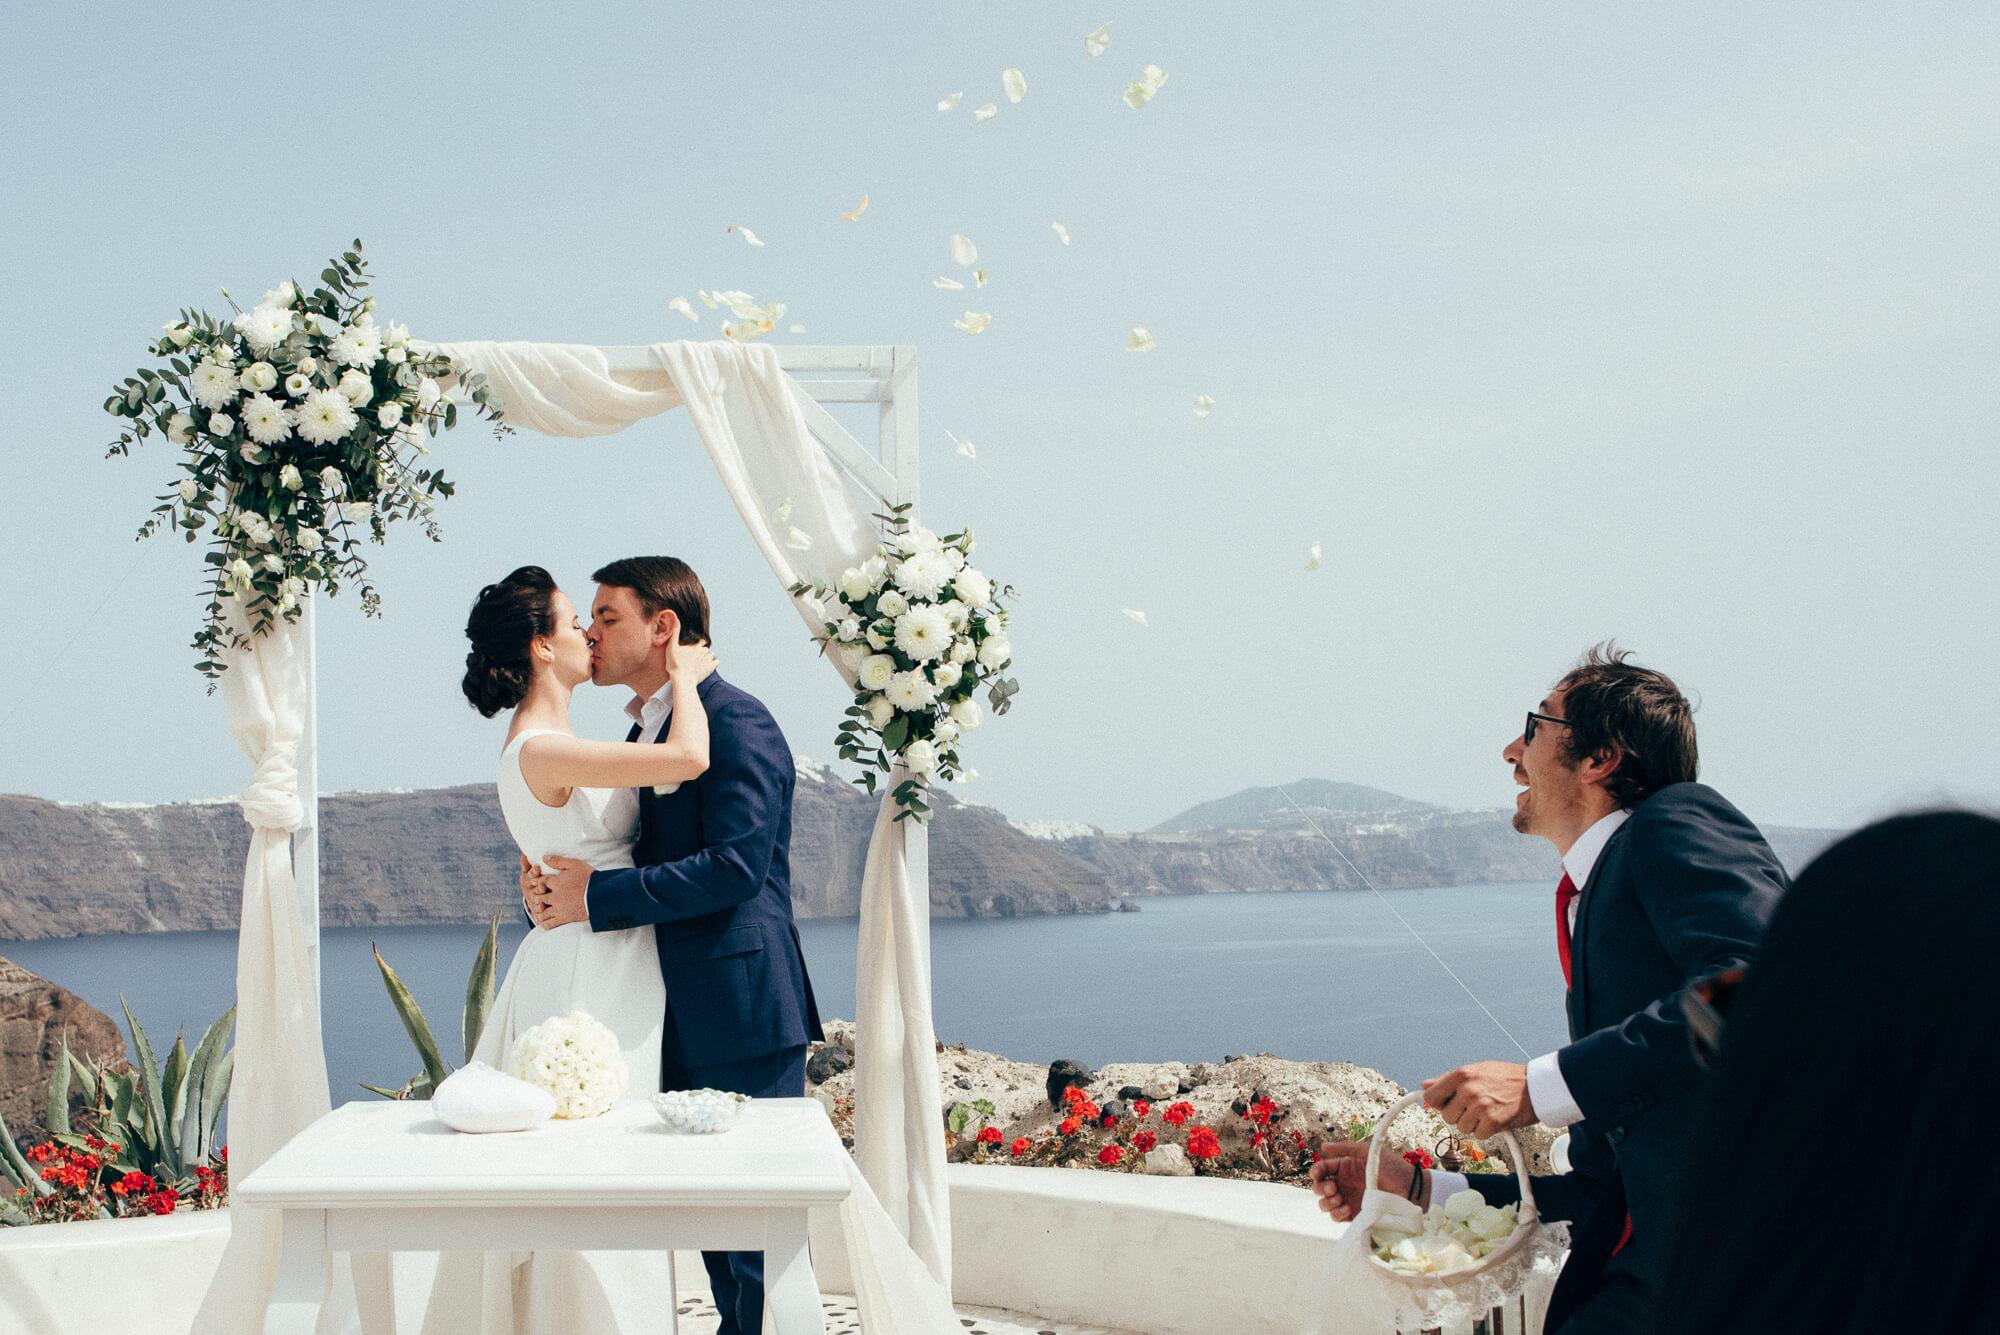 manes-wedding-photographer-greece-122